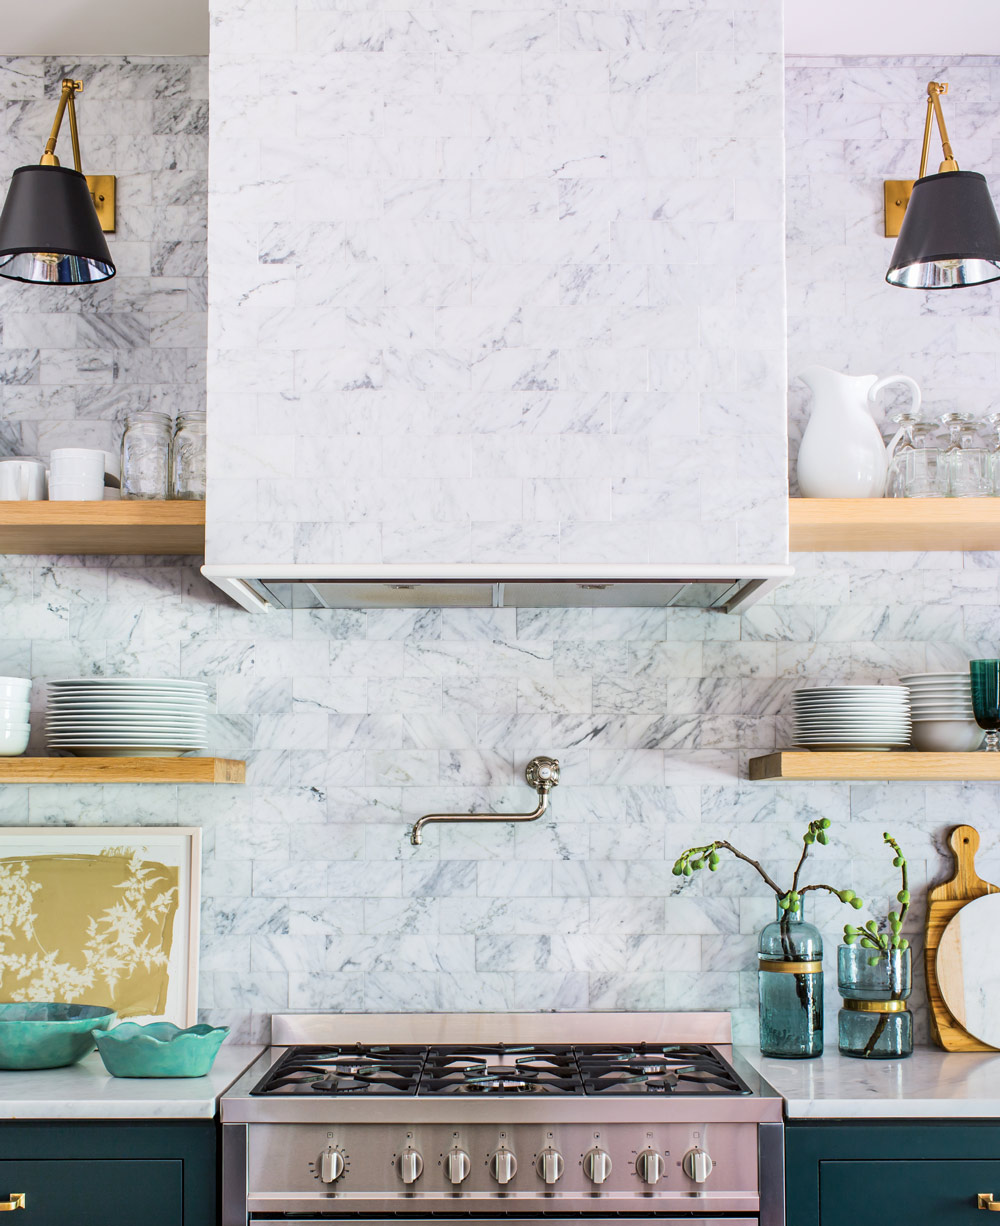 Kitchen and bath renovations designed to last - Atlanta Magazine